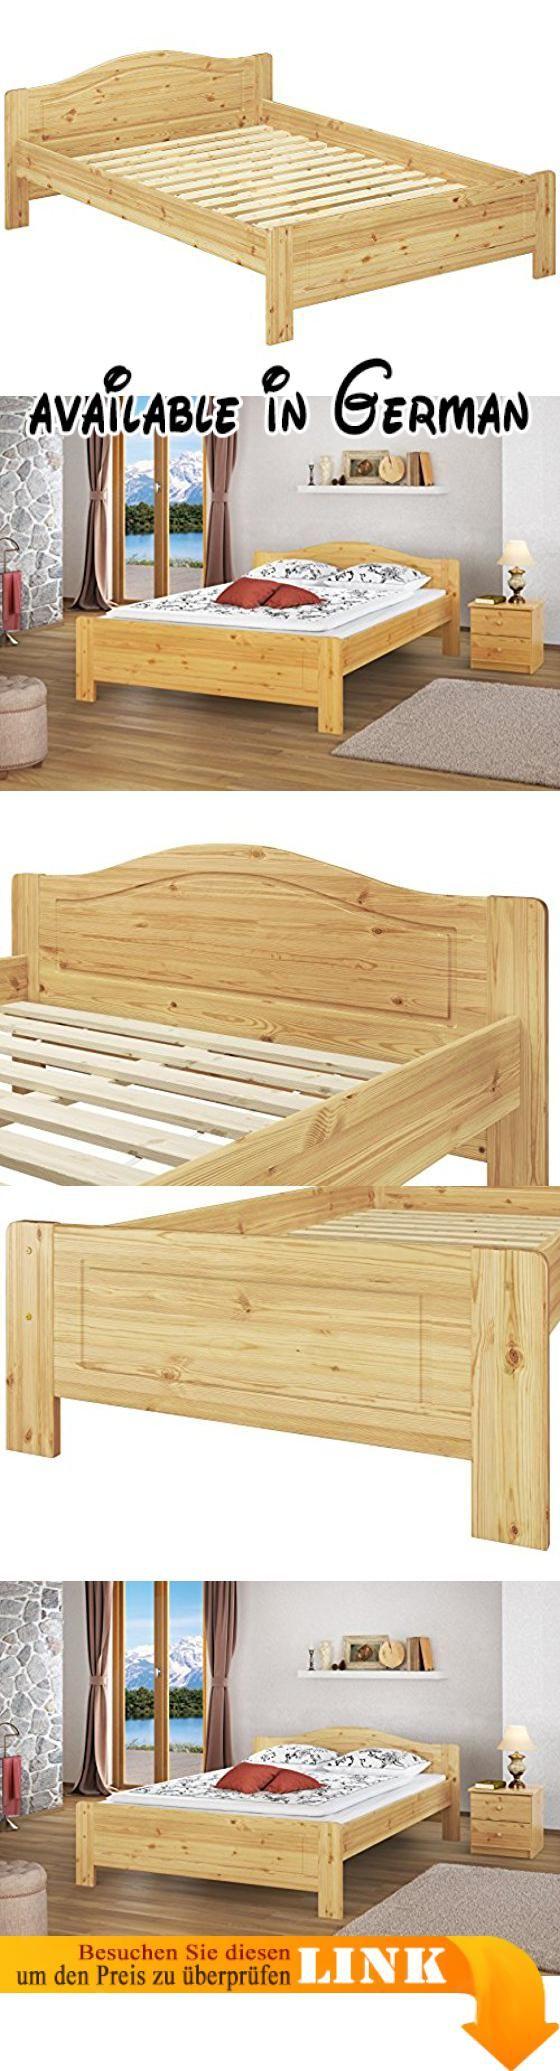 die besten 25 futonbett 140x200 ideen auf pinterest bett massivholz bett massivholz 140x200. Black Bedroom Furniture Sets. Home Design Ideas